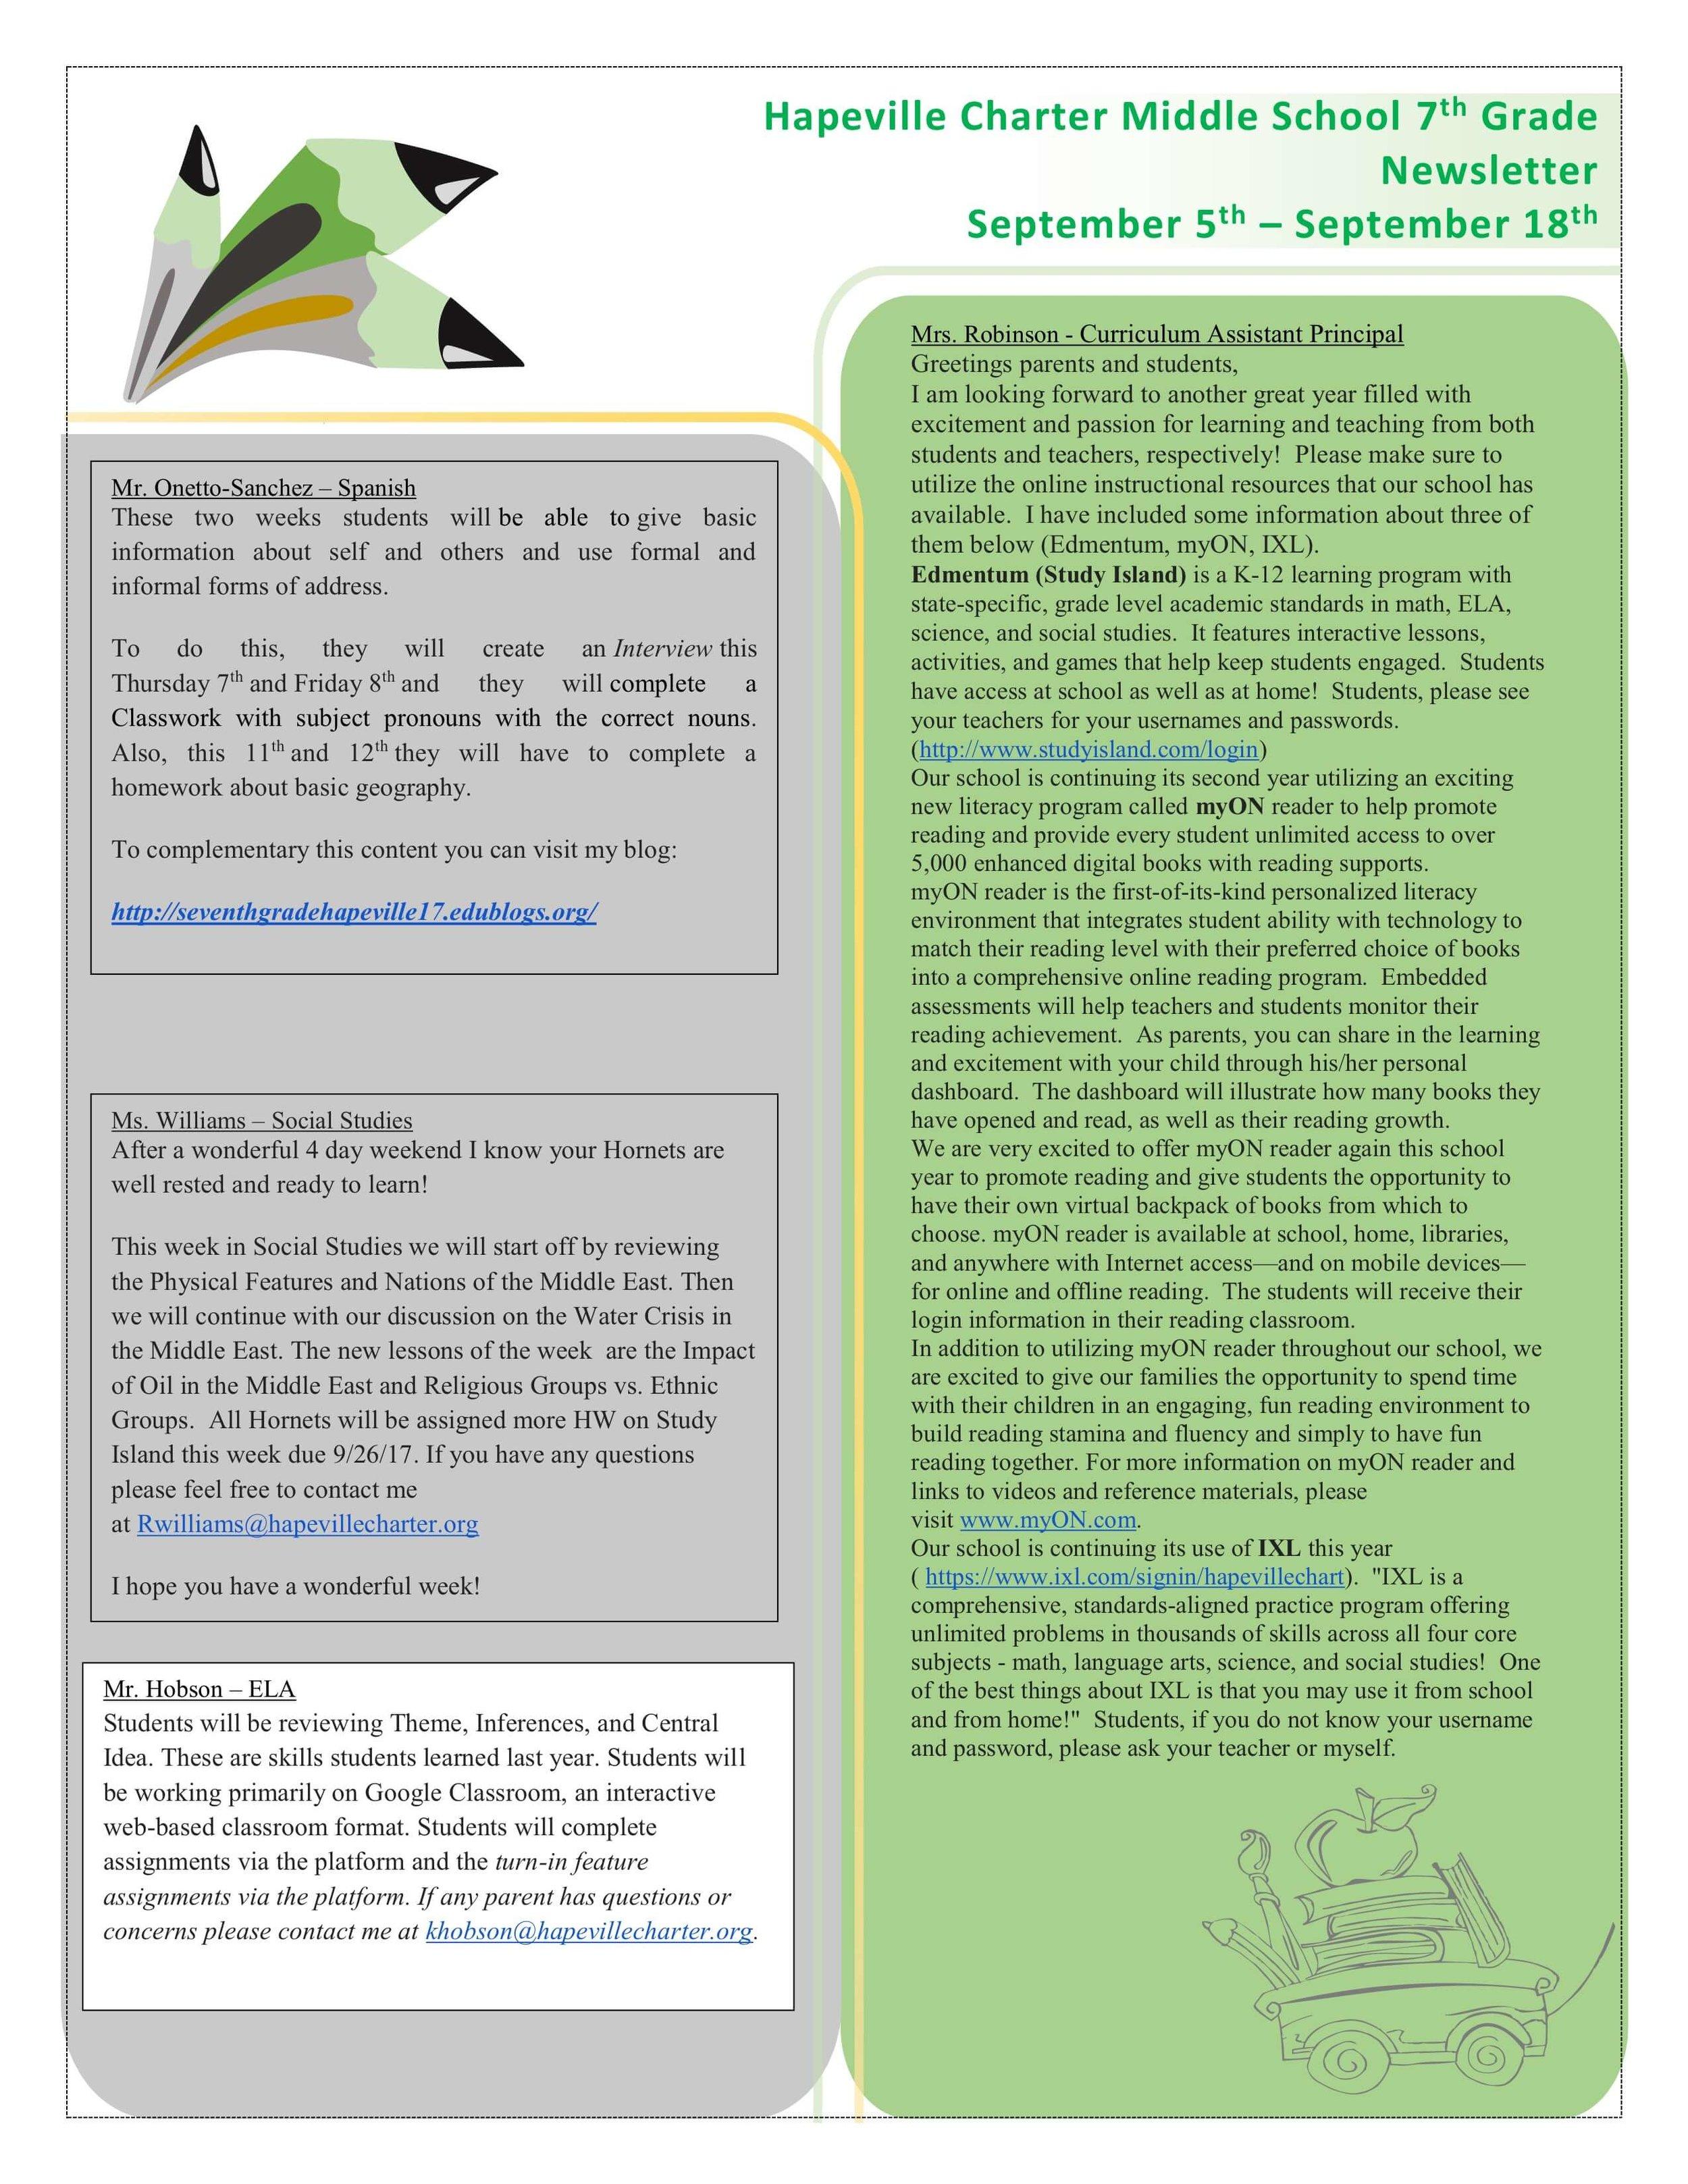 HCCA 7th Grade Newsletter -